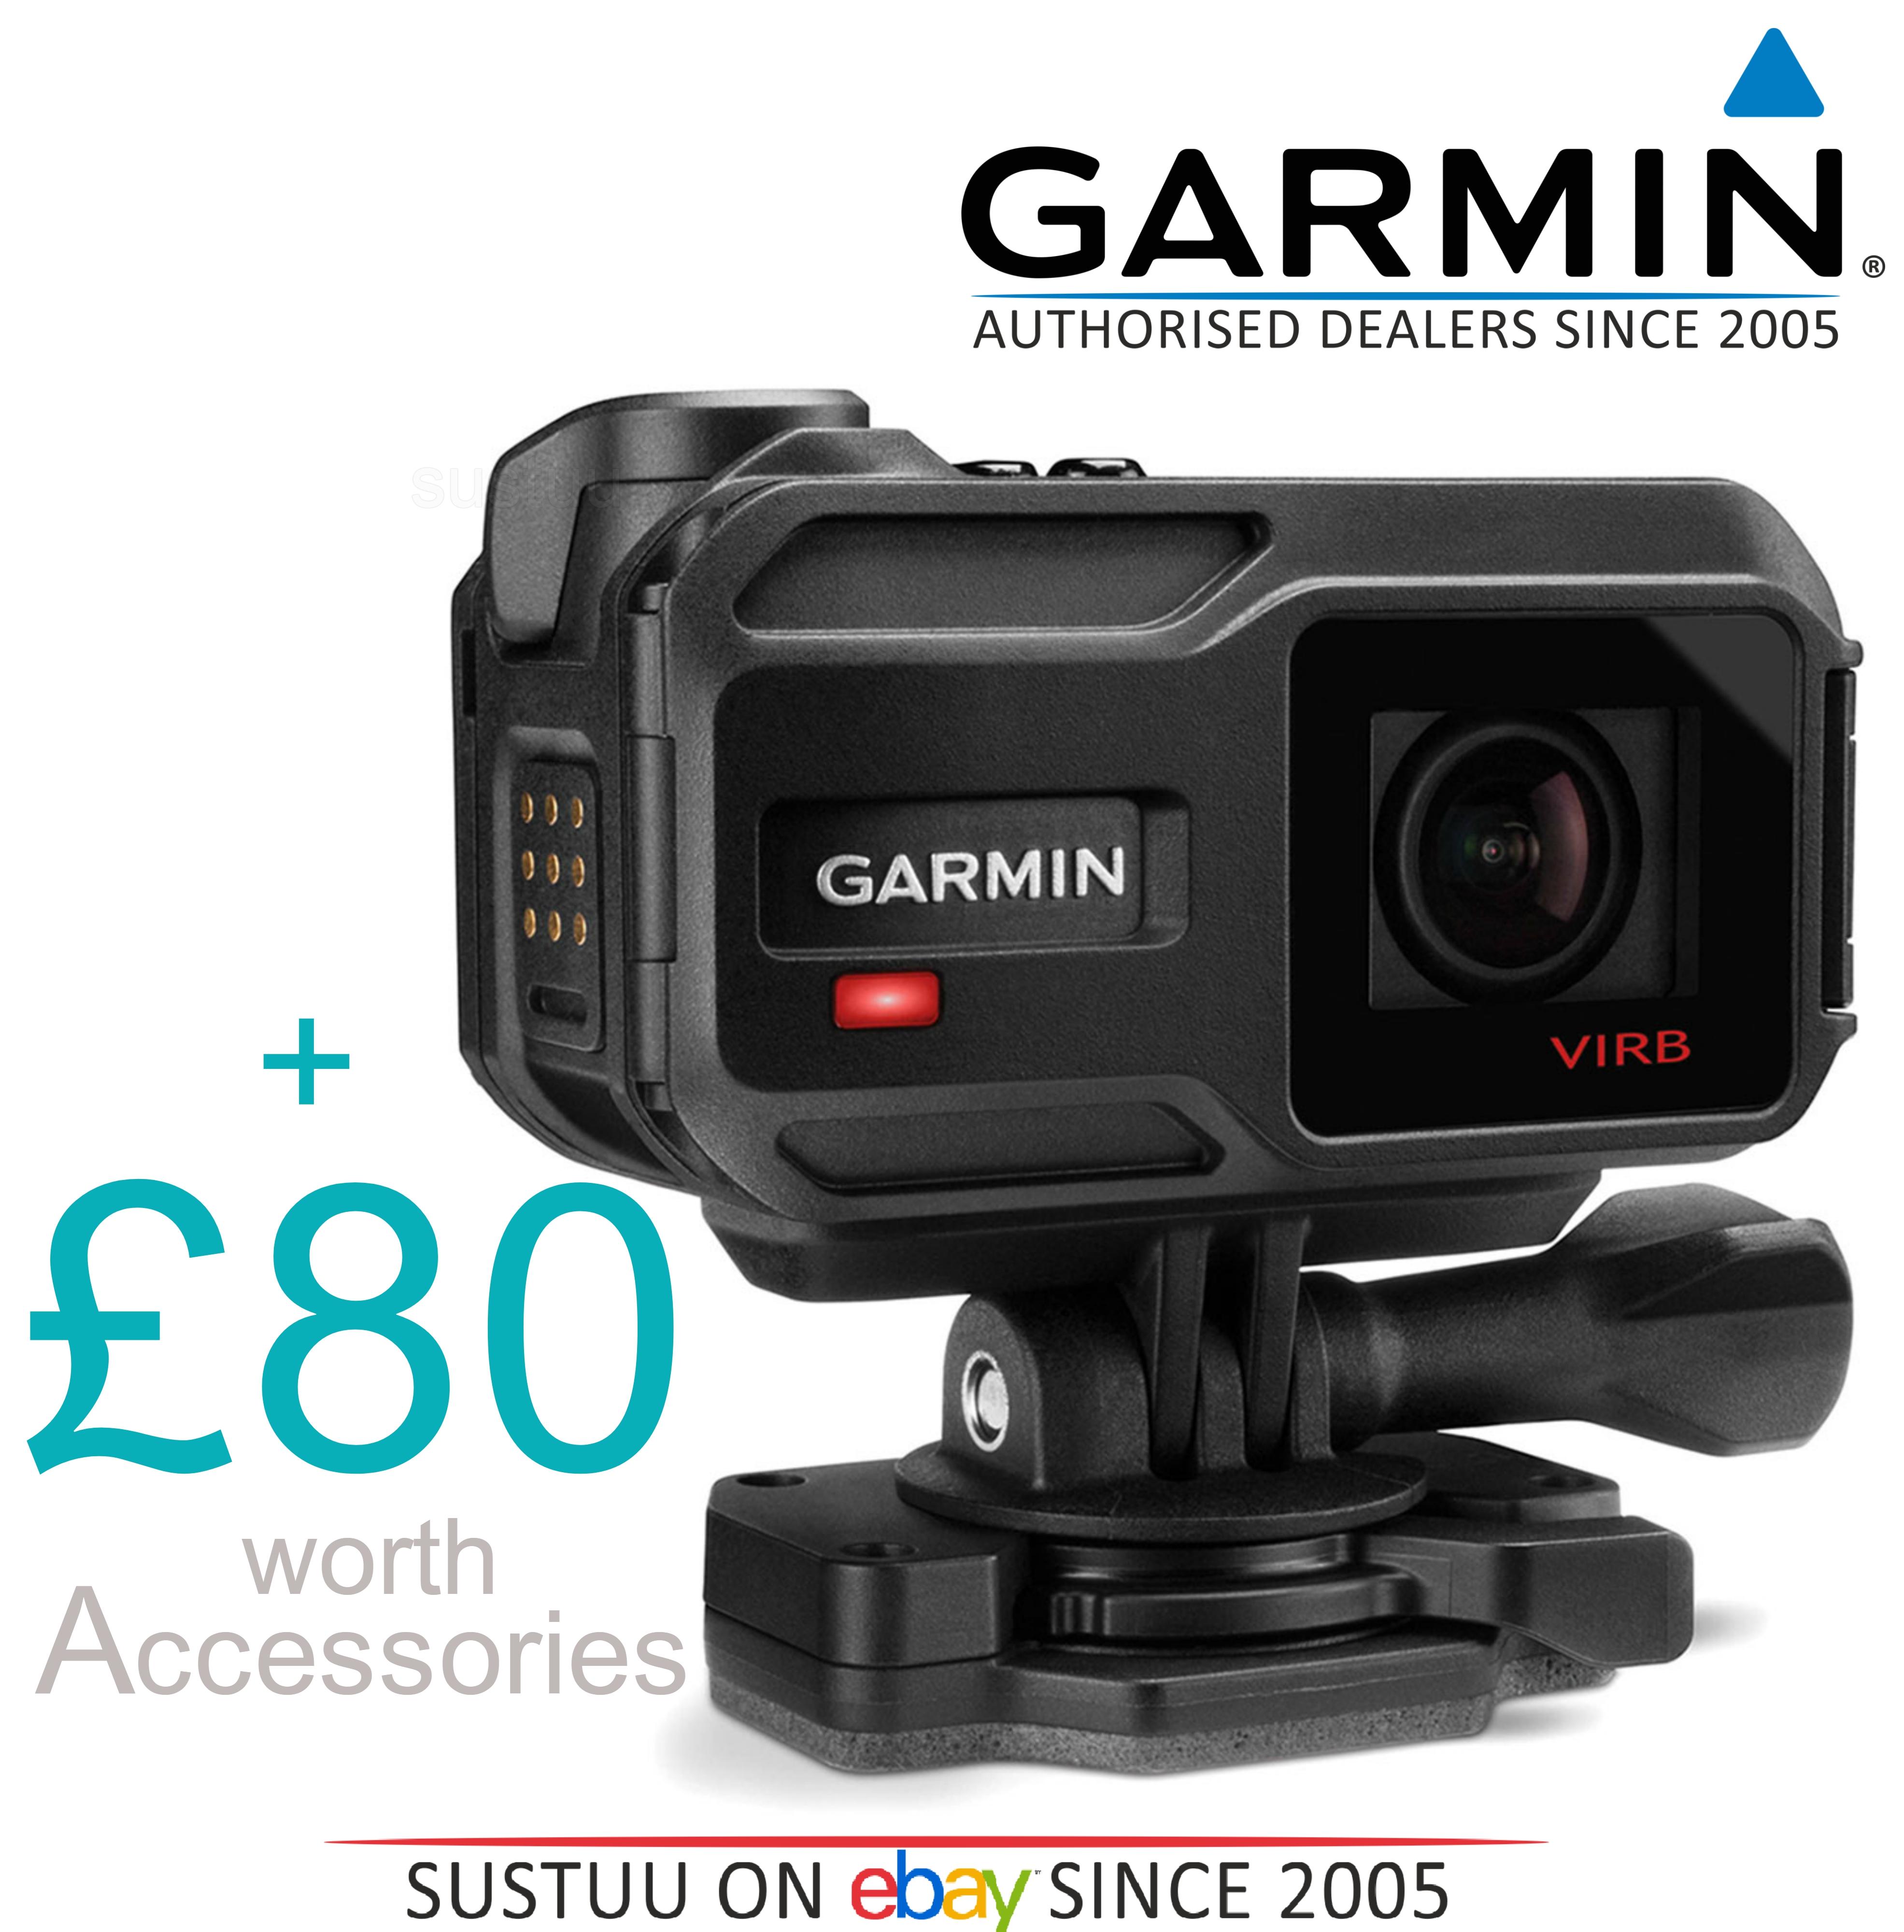 Garmin VIRB XE Full HD 1080P GPS ANT Outdoor Sports Waterproof Action Camera